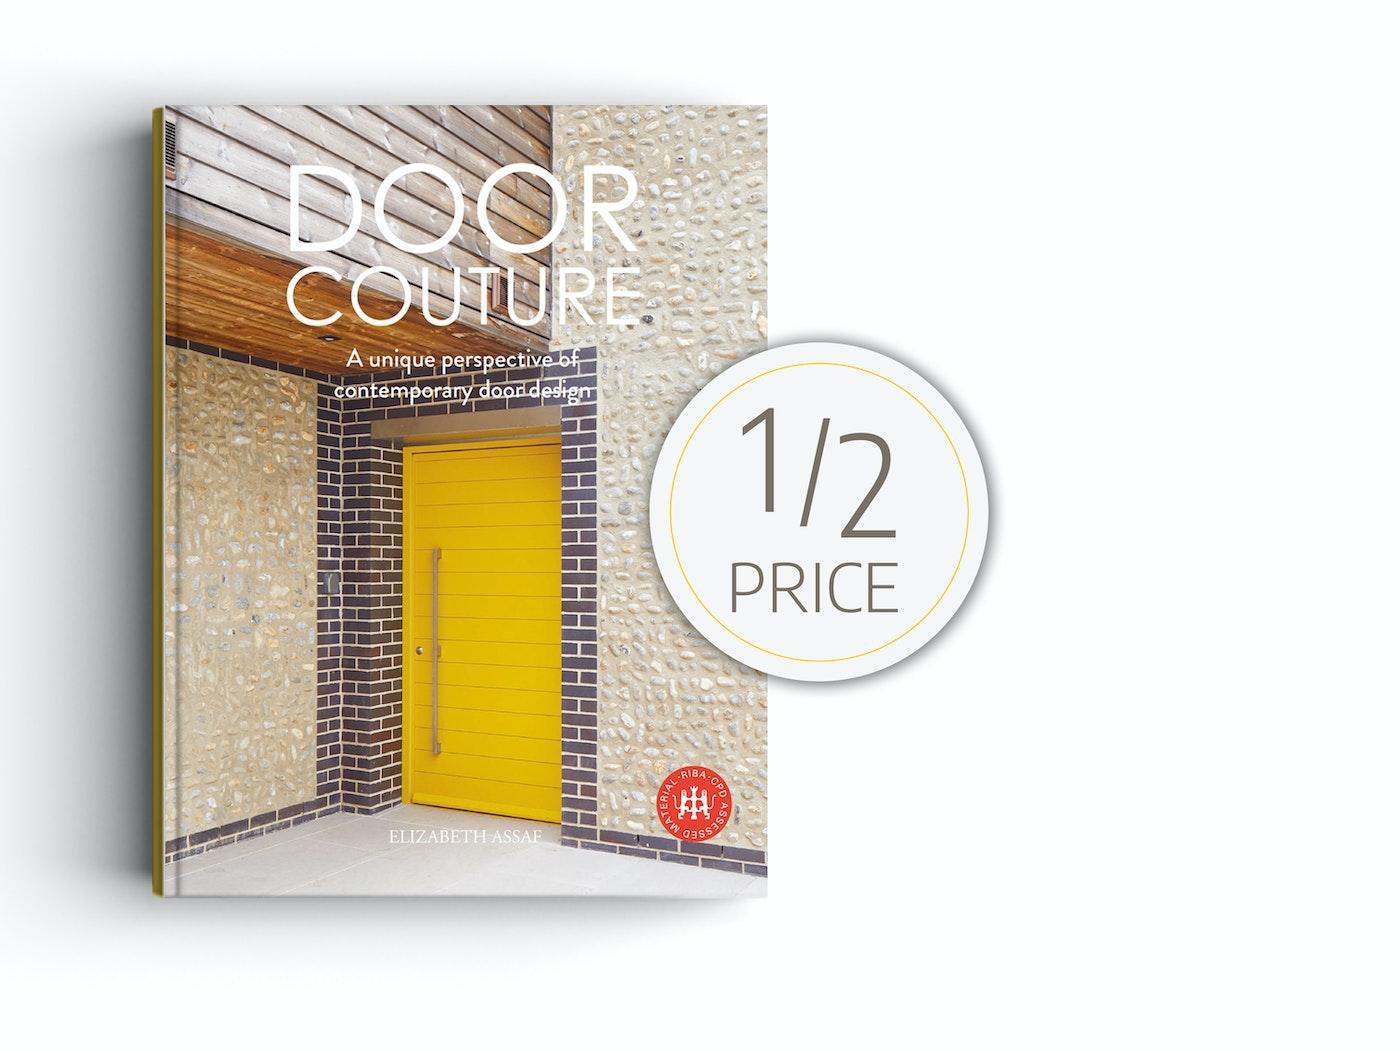 half price book offer